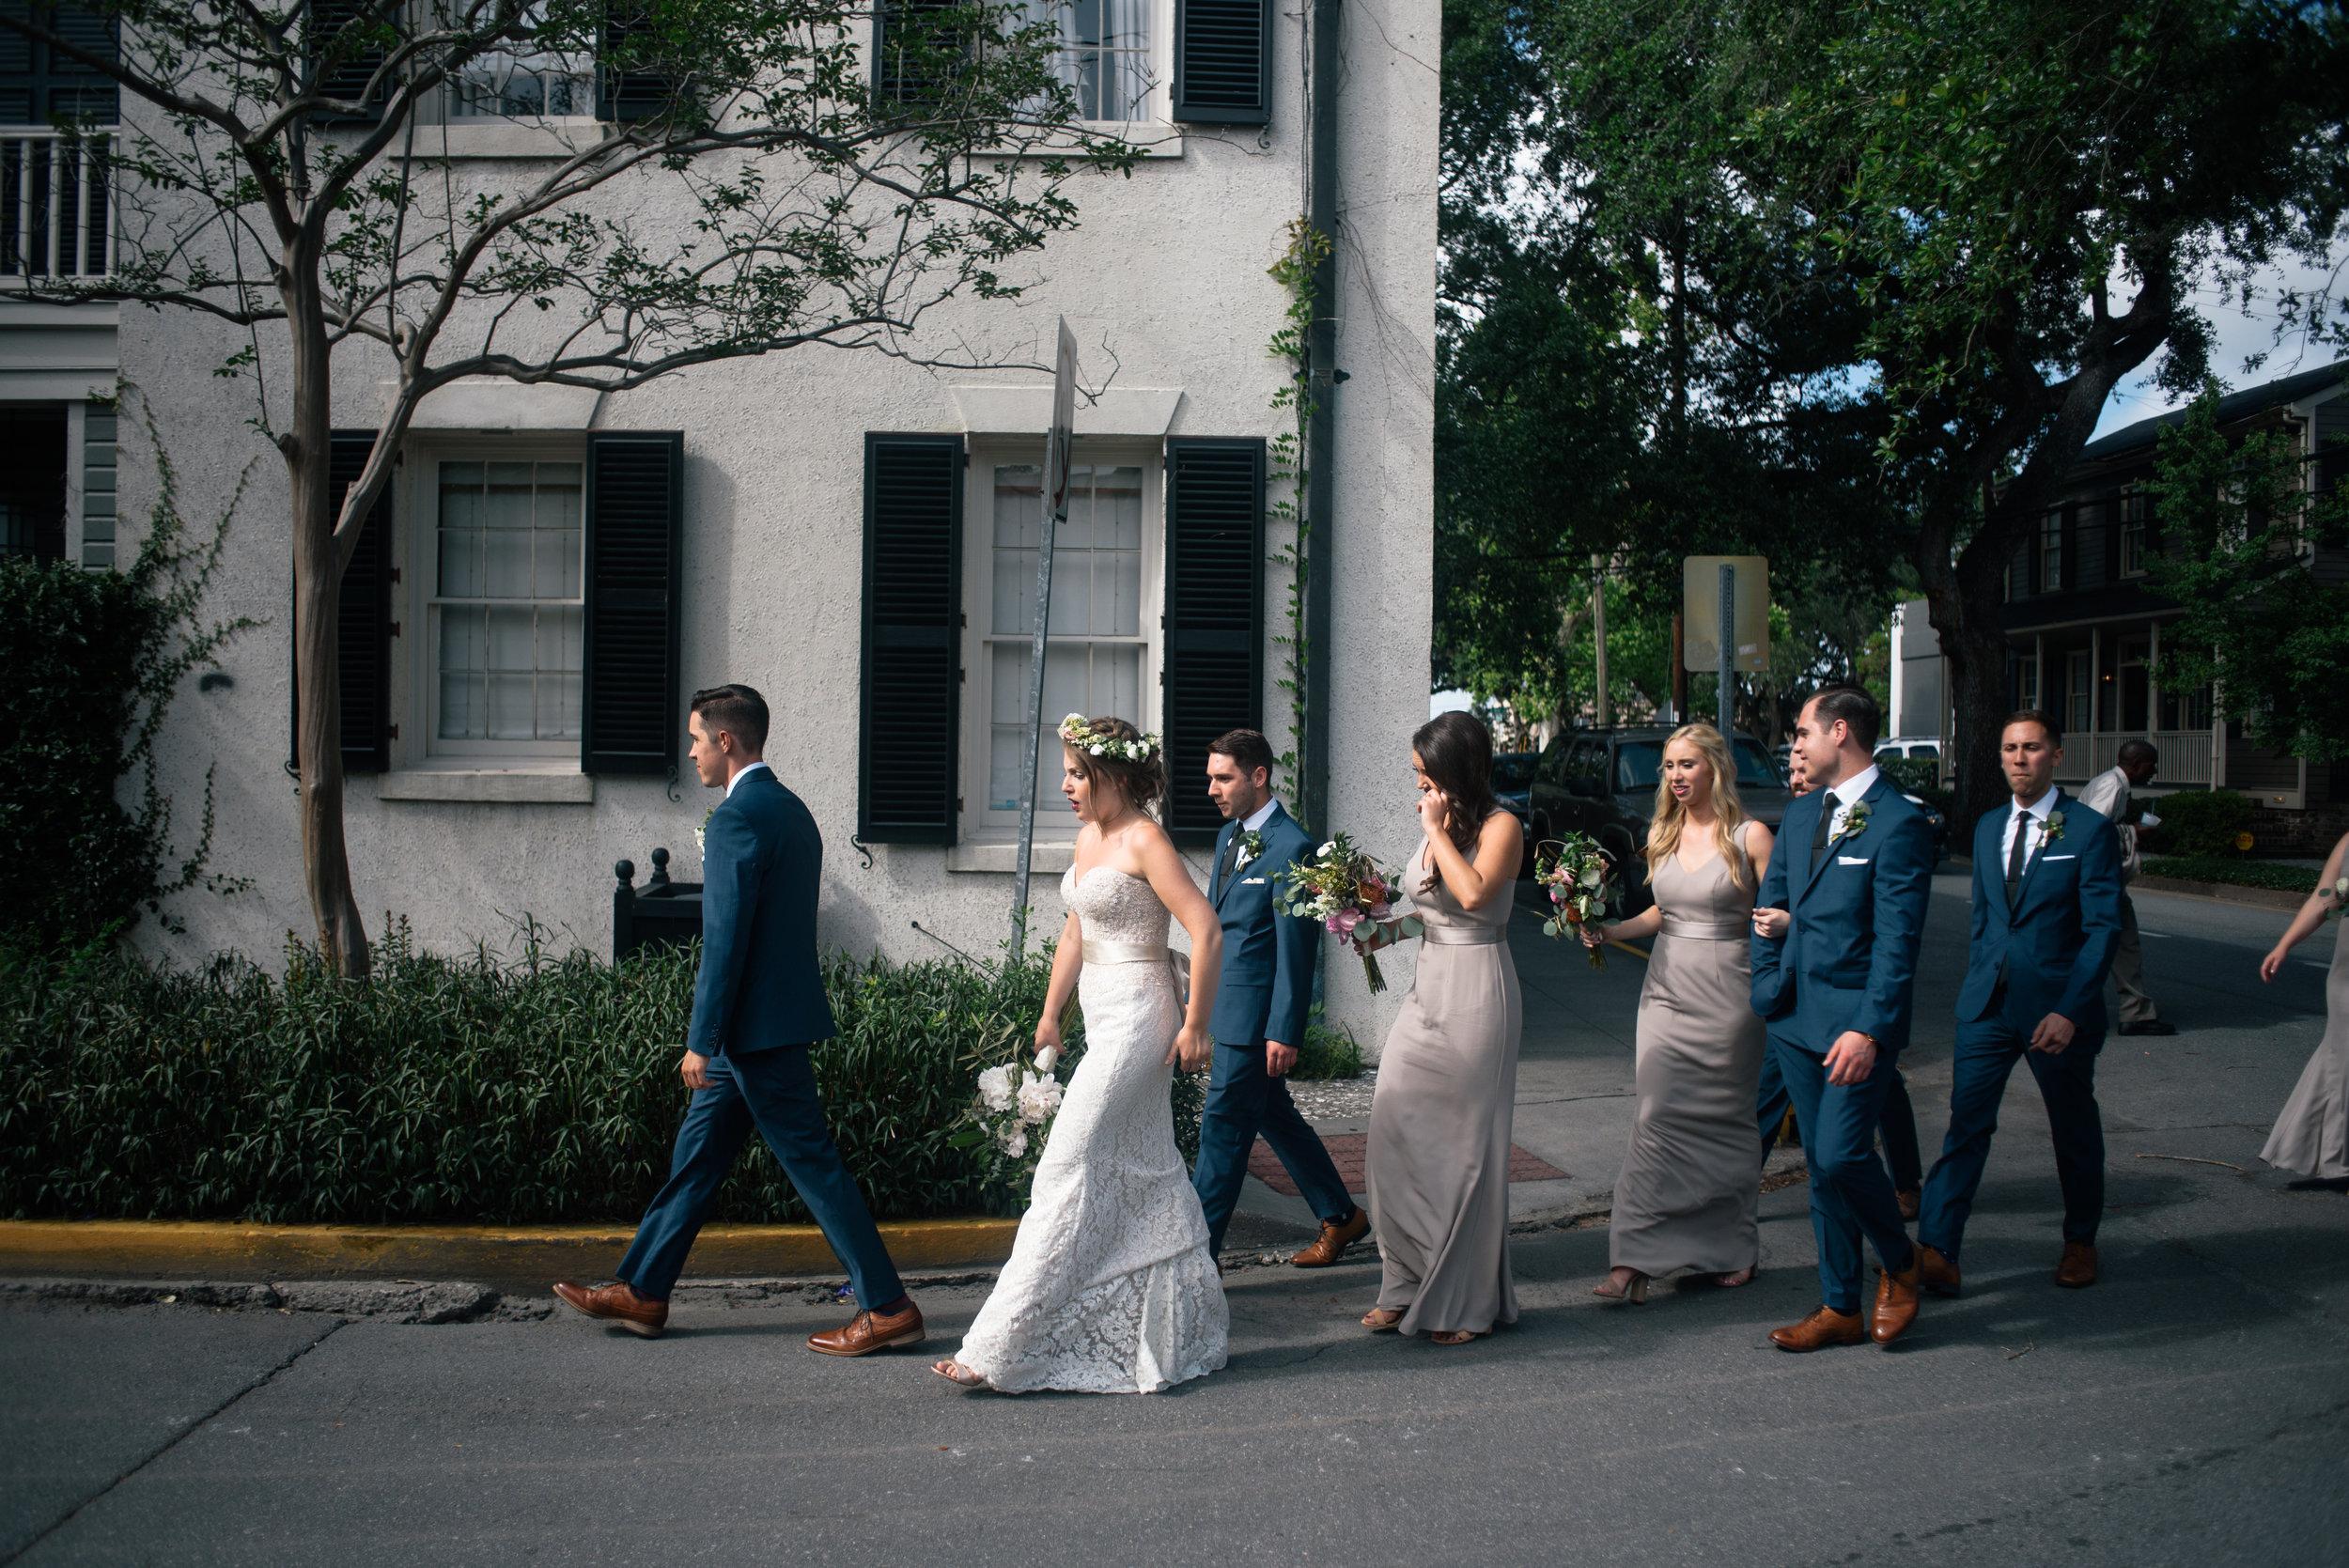 savannah-station-elopement-photographer-savannah-elopement-photography-savannah-georgia-elopement-photographer-savannah-wedding-photographer-meg-hill-photo-jade-hill- (52 of 93).jpg